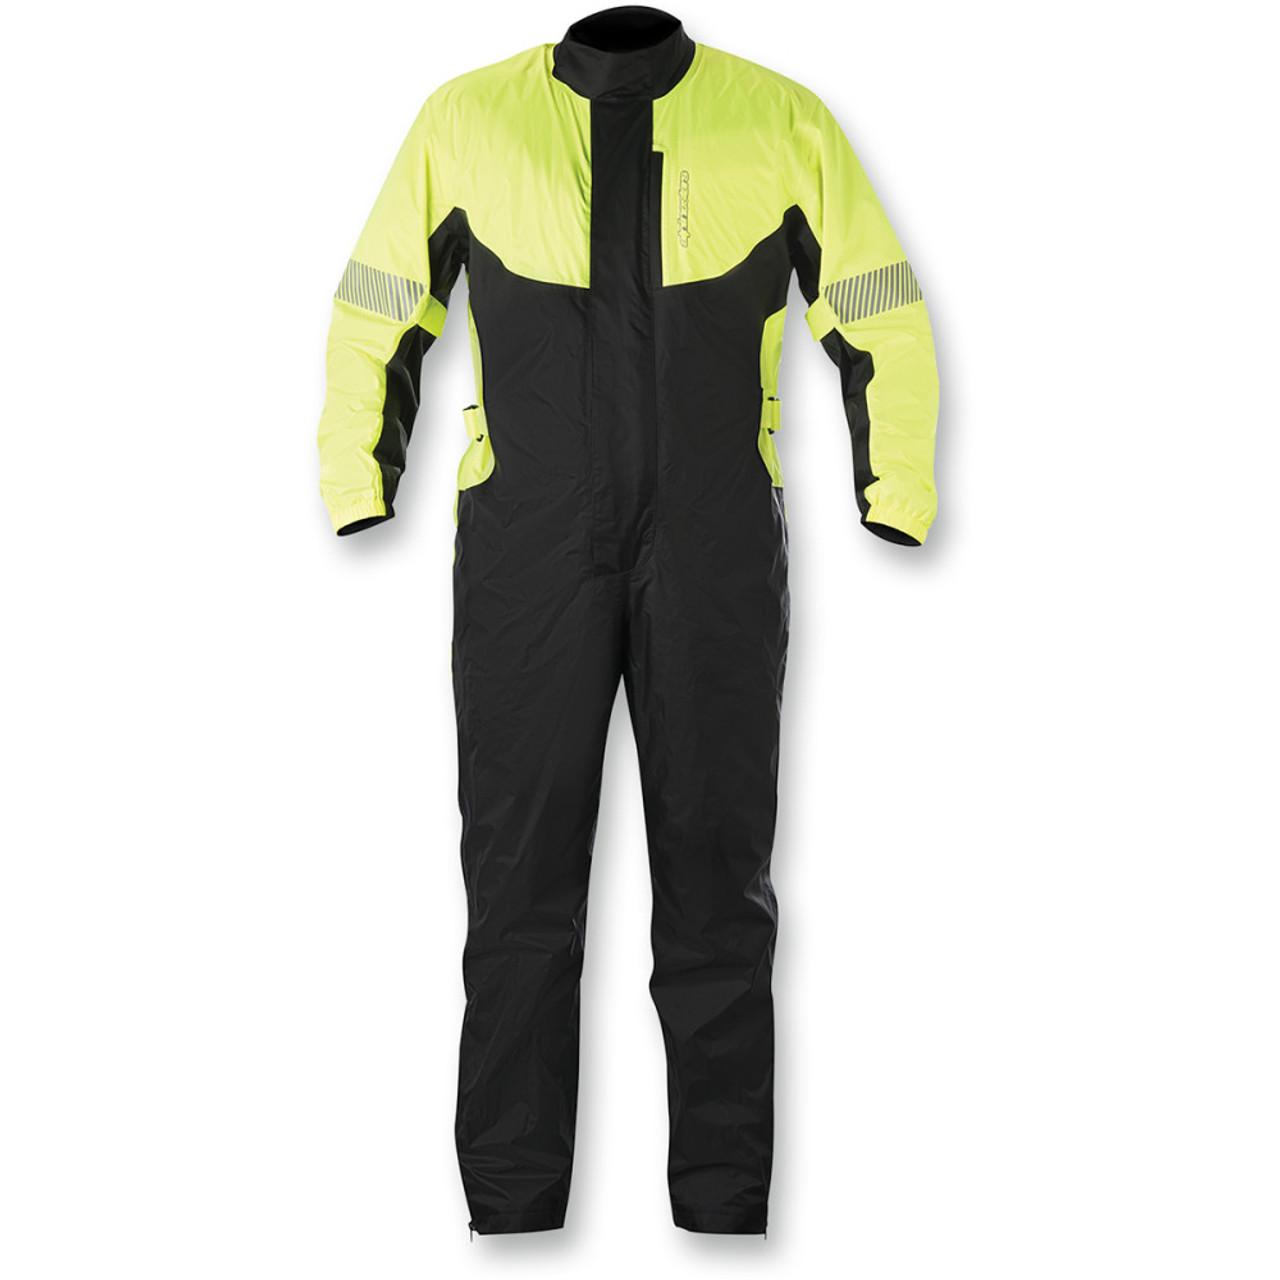 98bd6df1aa3 Alpinestars Hurricane Motorcycle Rain Suit - Black/Yellow - Get Lowered  Cycles